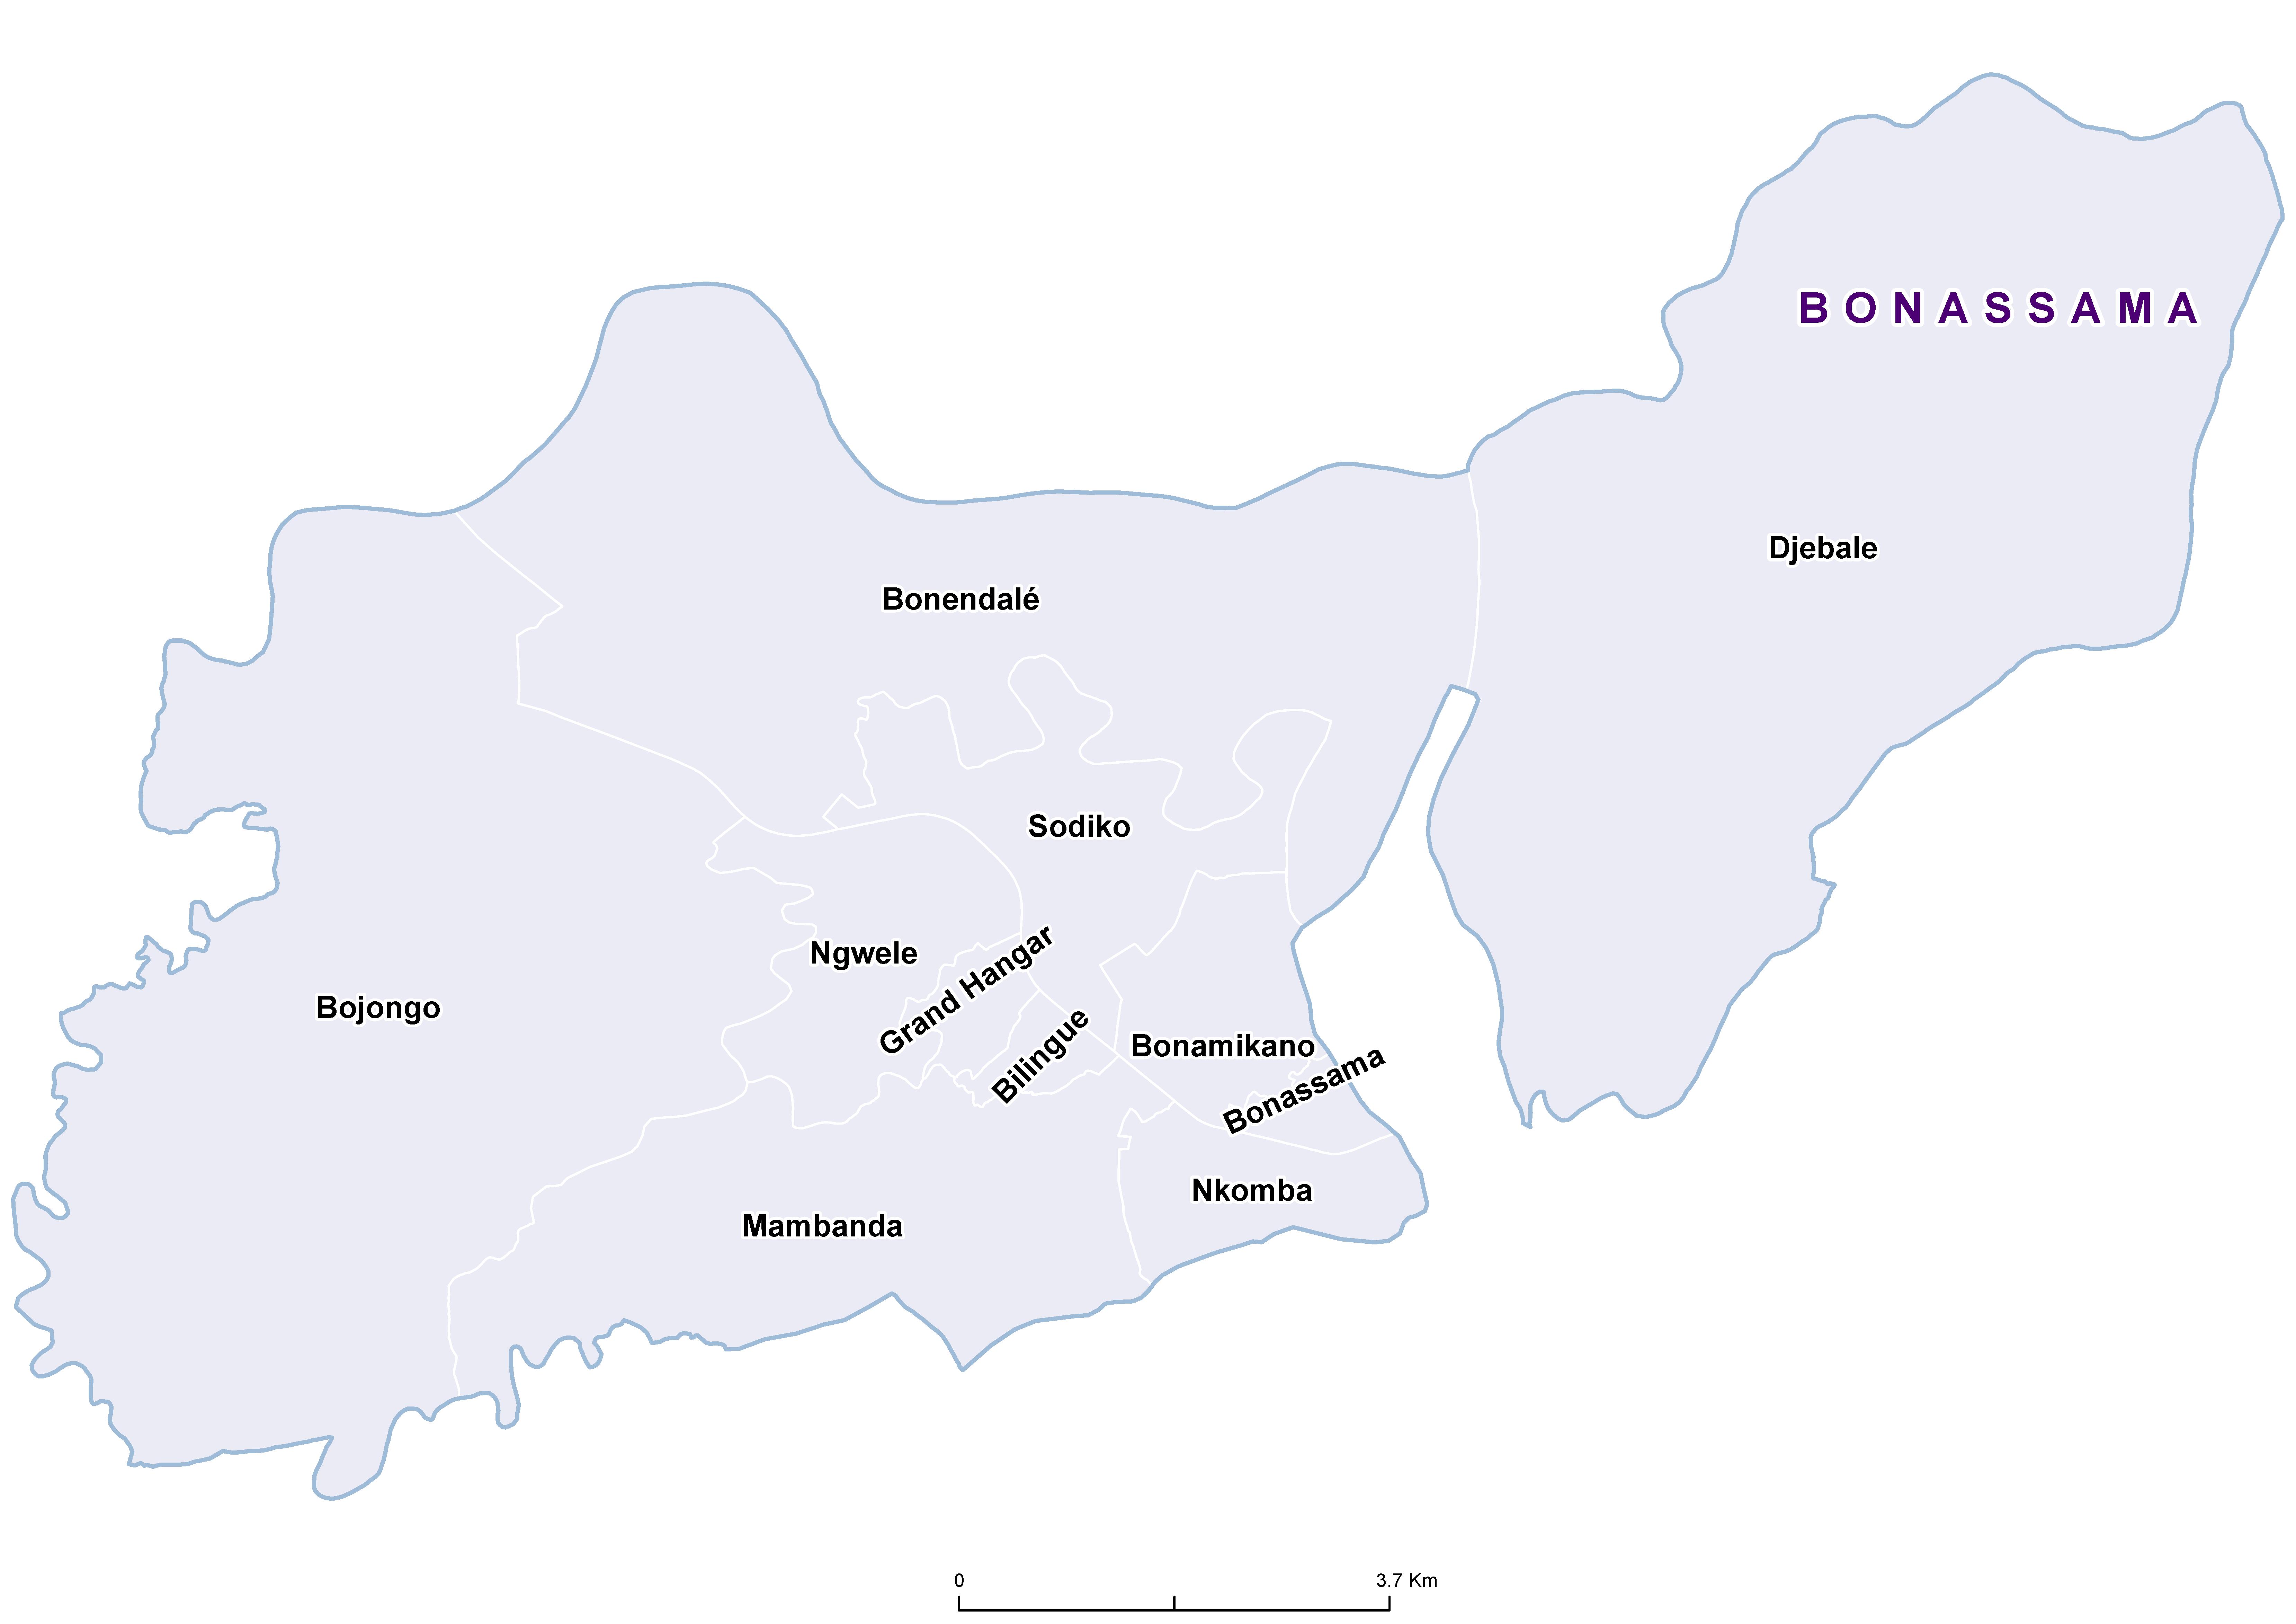 Bonassama SCH 20180001